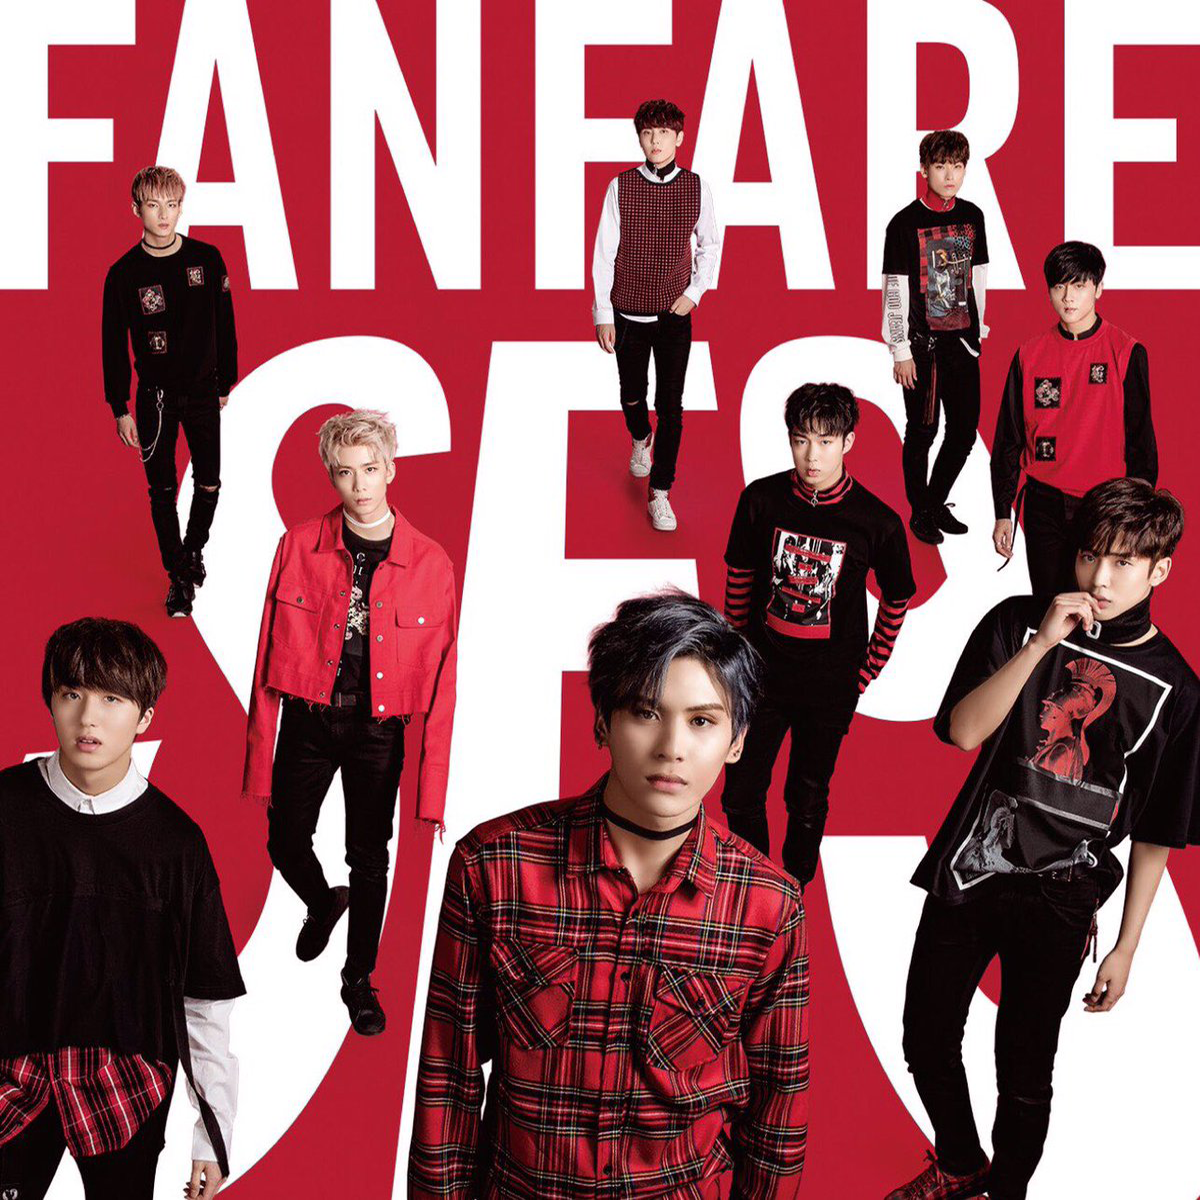 Fanfare (SF9 Japanese single)